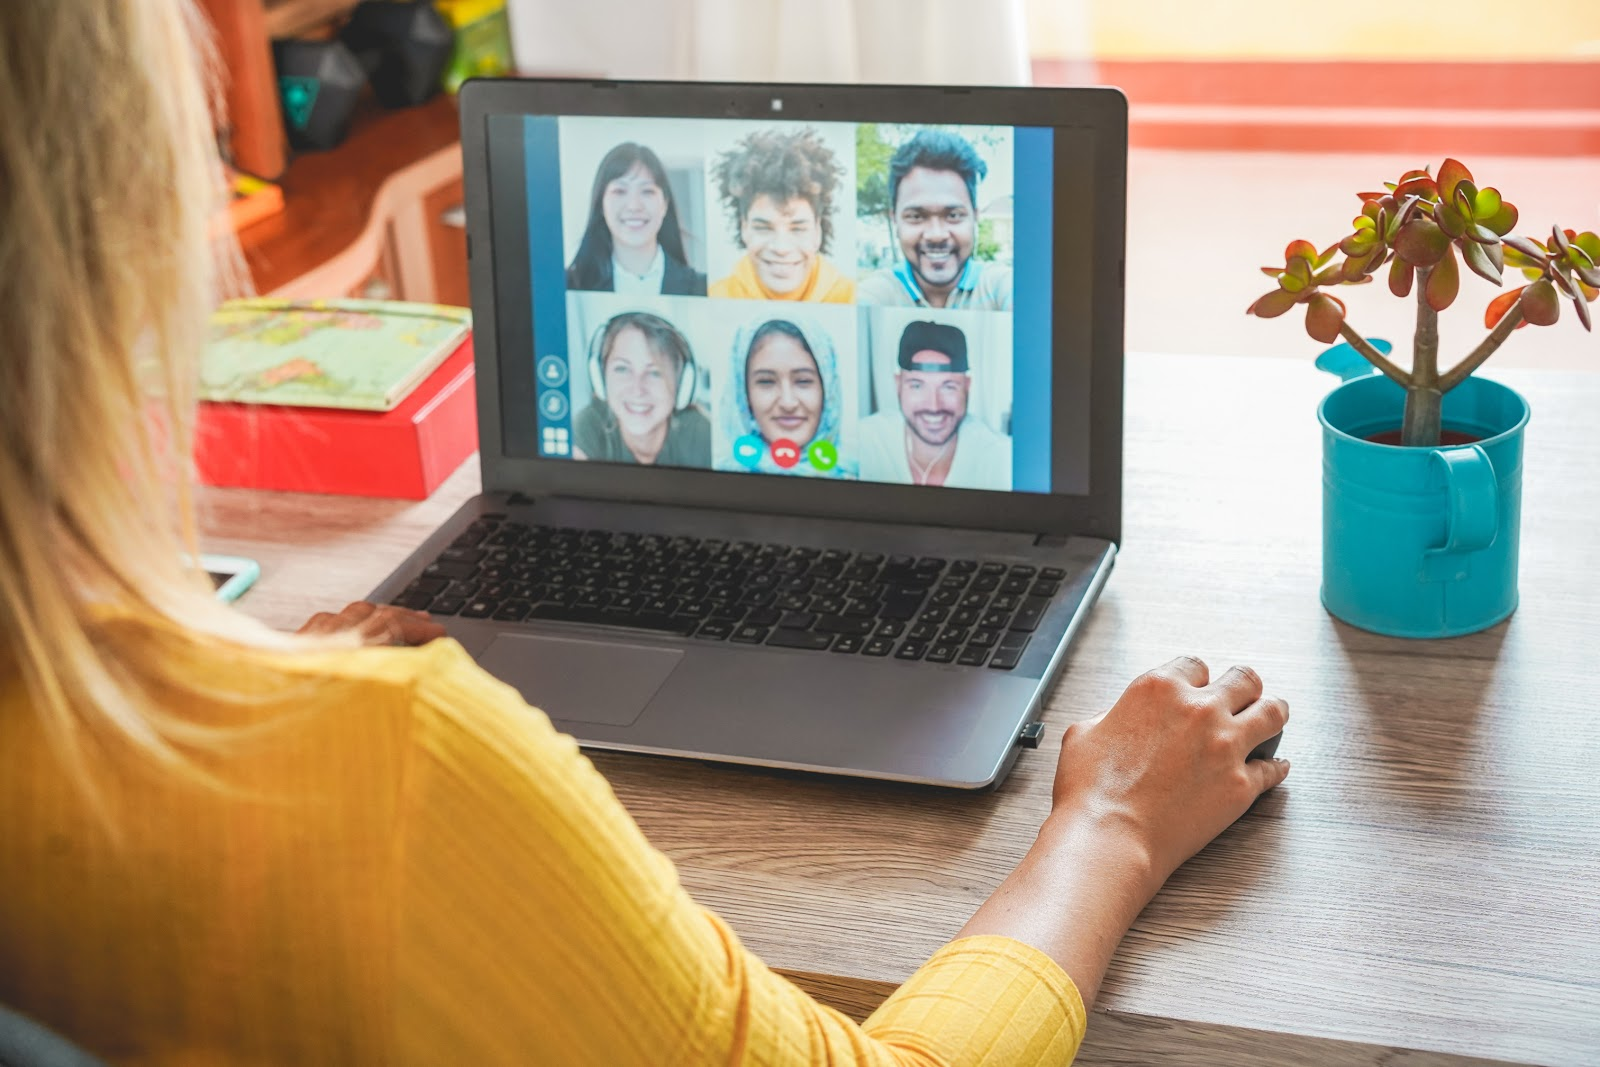 Team members enjoy a team call as part of a virtual retreat